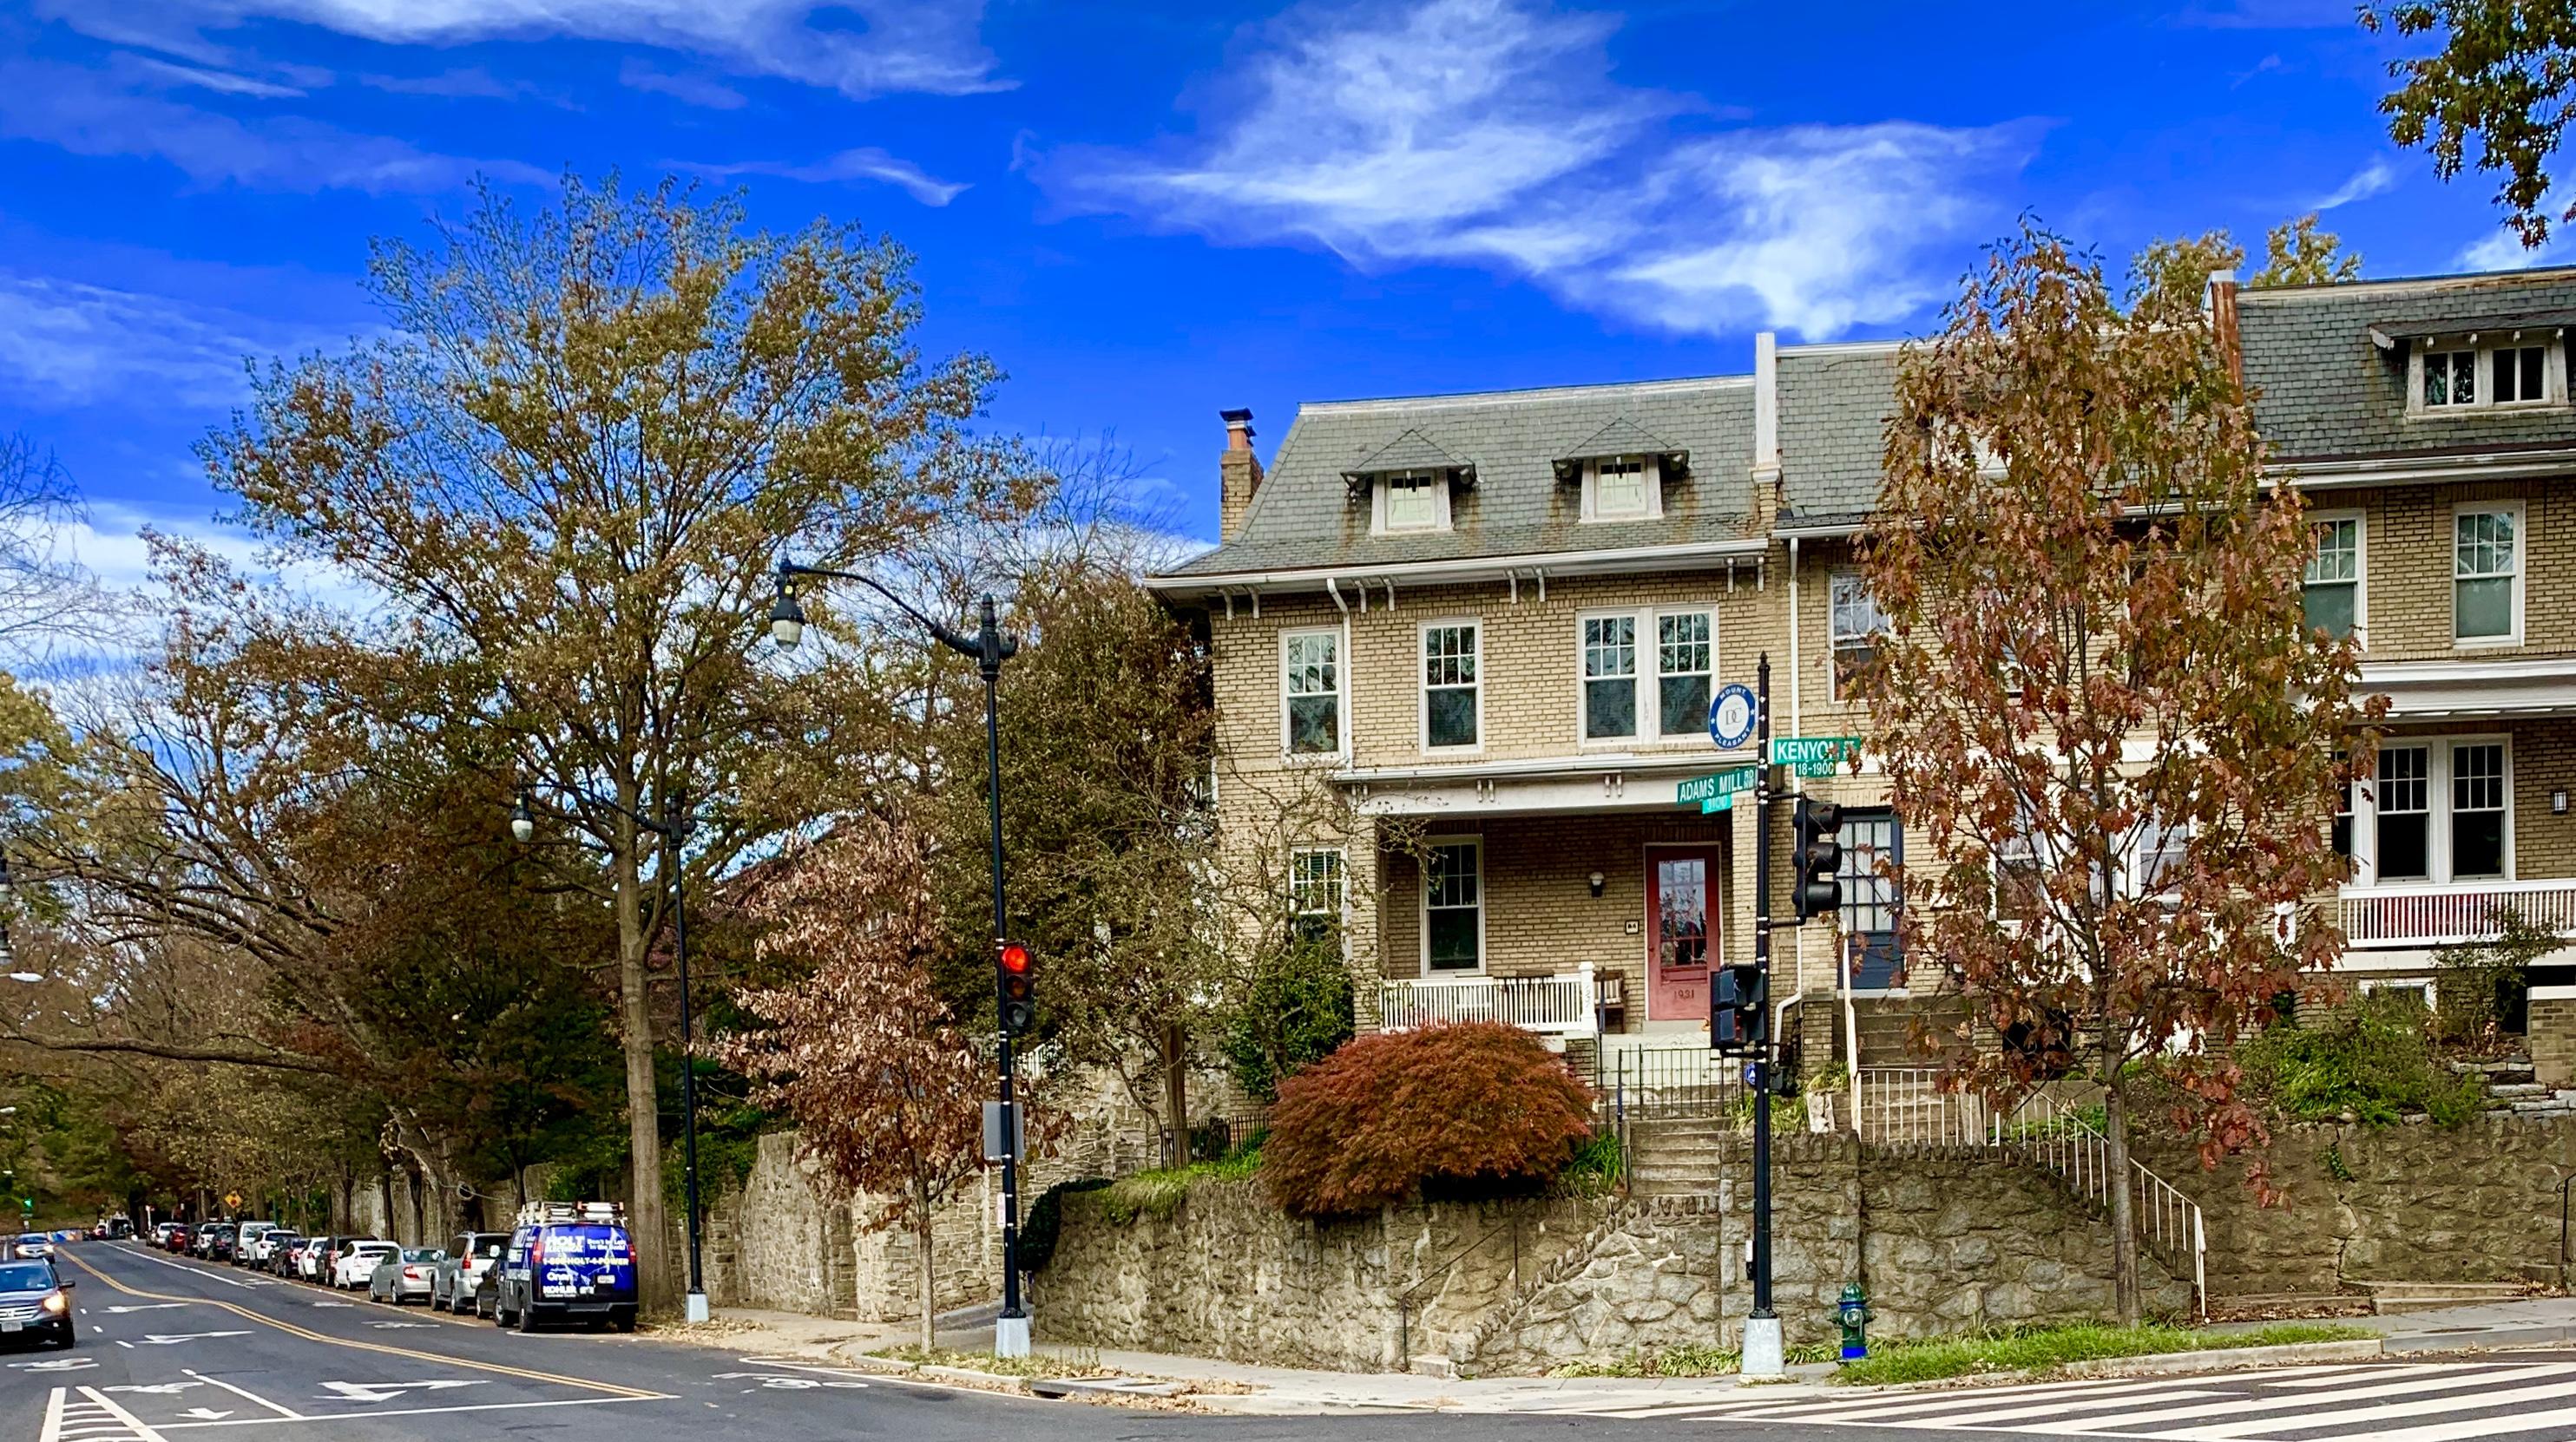 Craftsman Homes in Washington, DC. Adams Mill Rd in Mount Pleasant